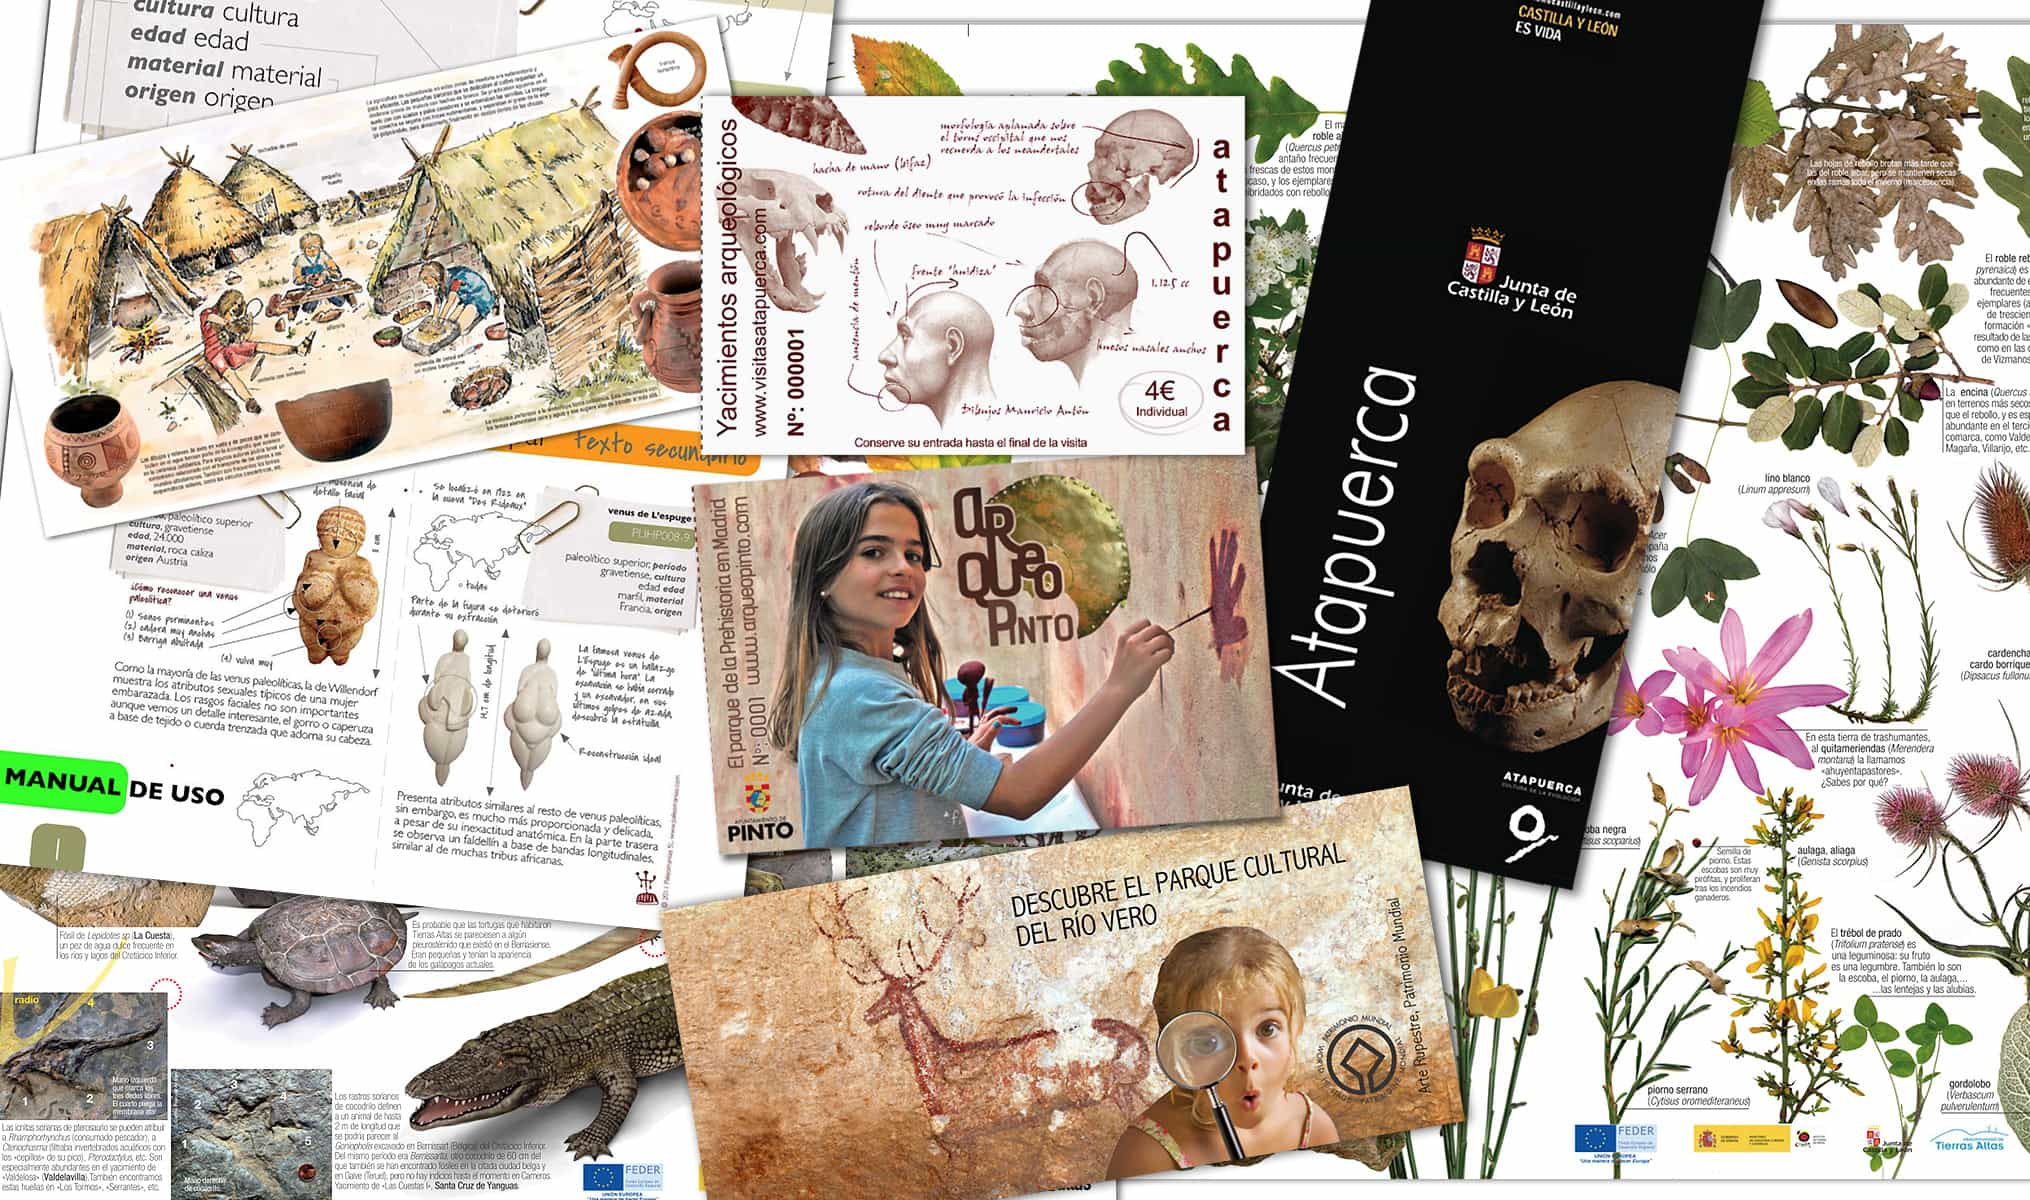 difusion-comunicacion-visual-patrimonio-arqueologico-natural-cultural-mad-paleorama